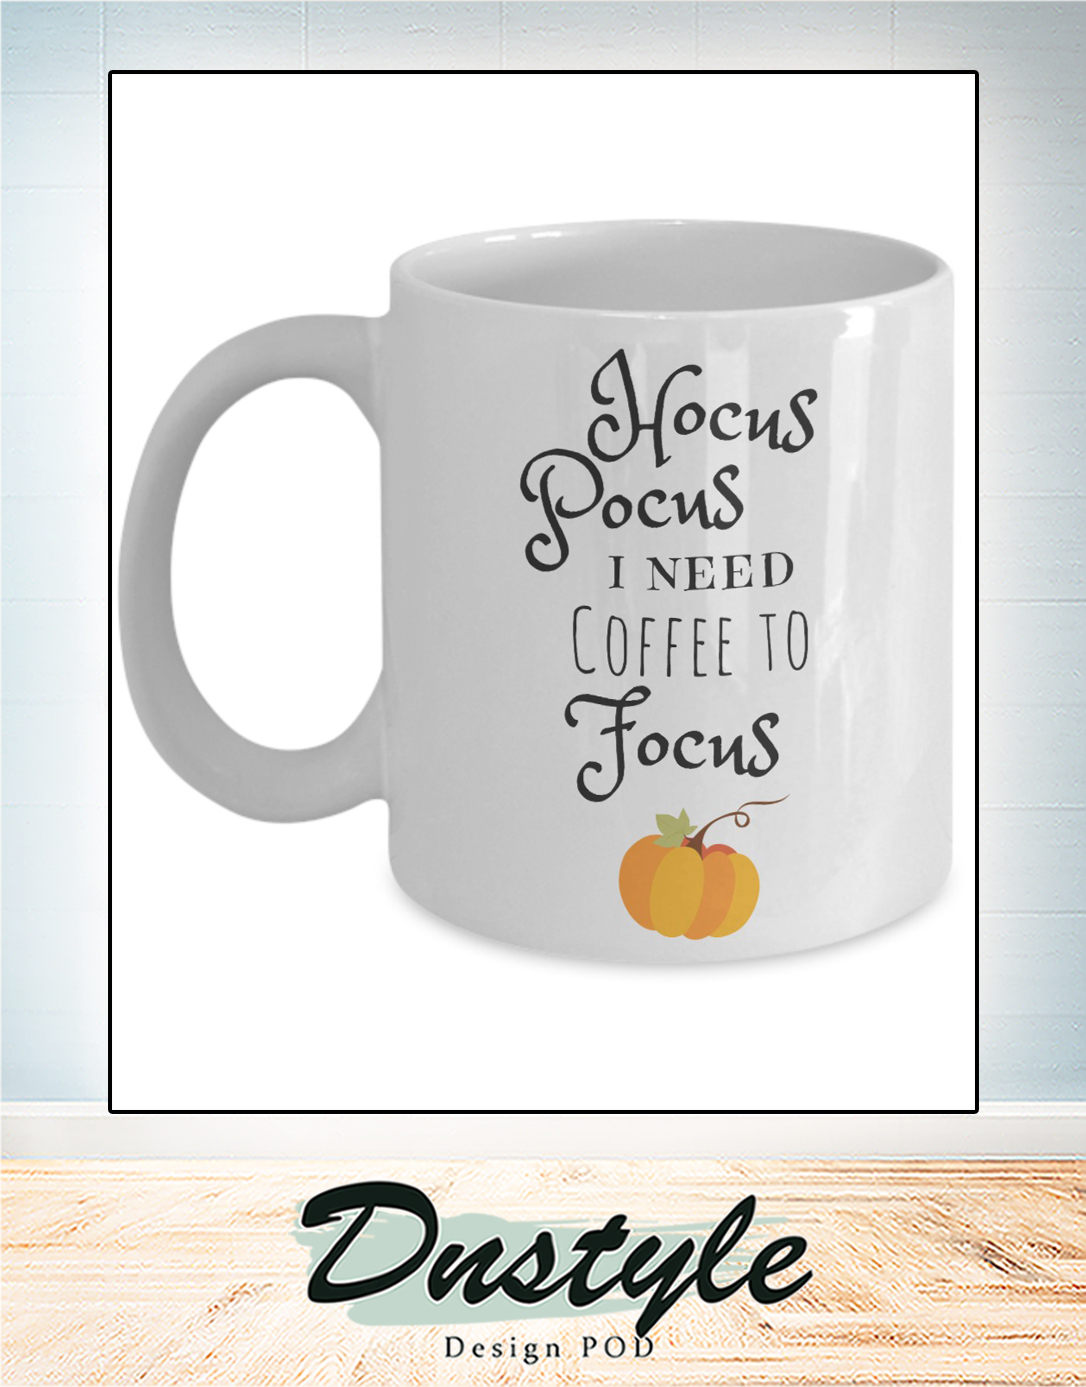 Hocus pocus I need coffee to focus mug